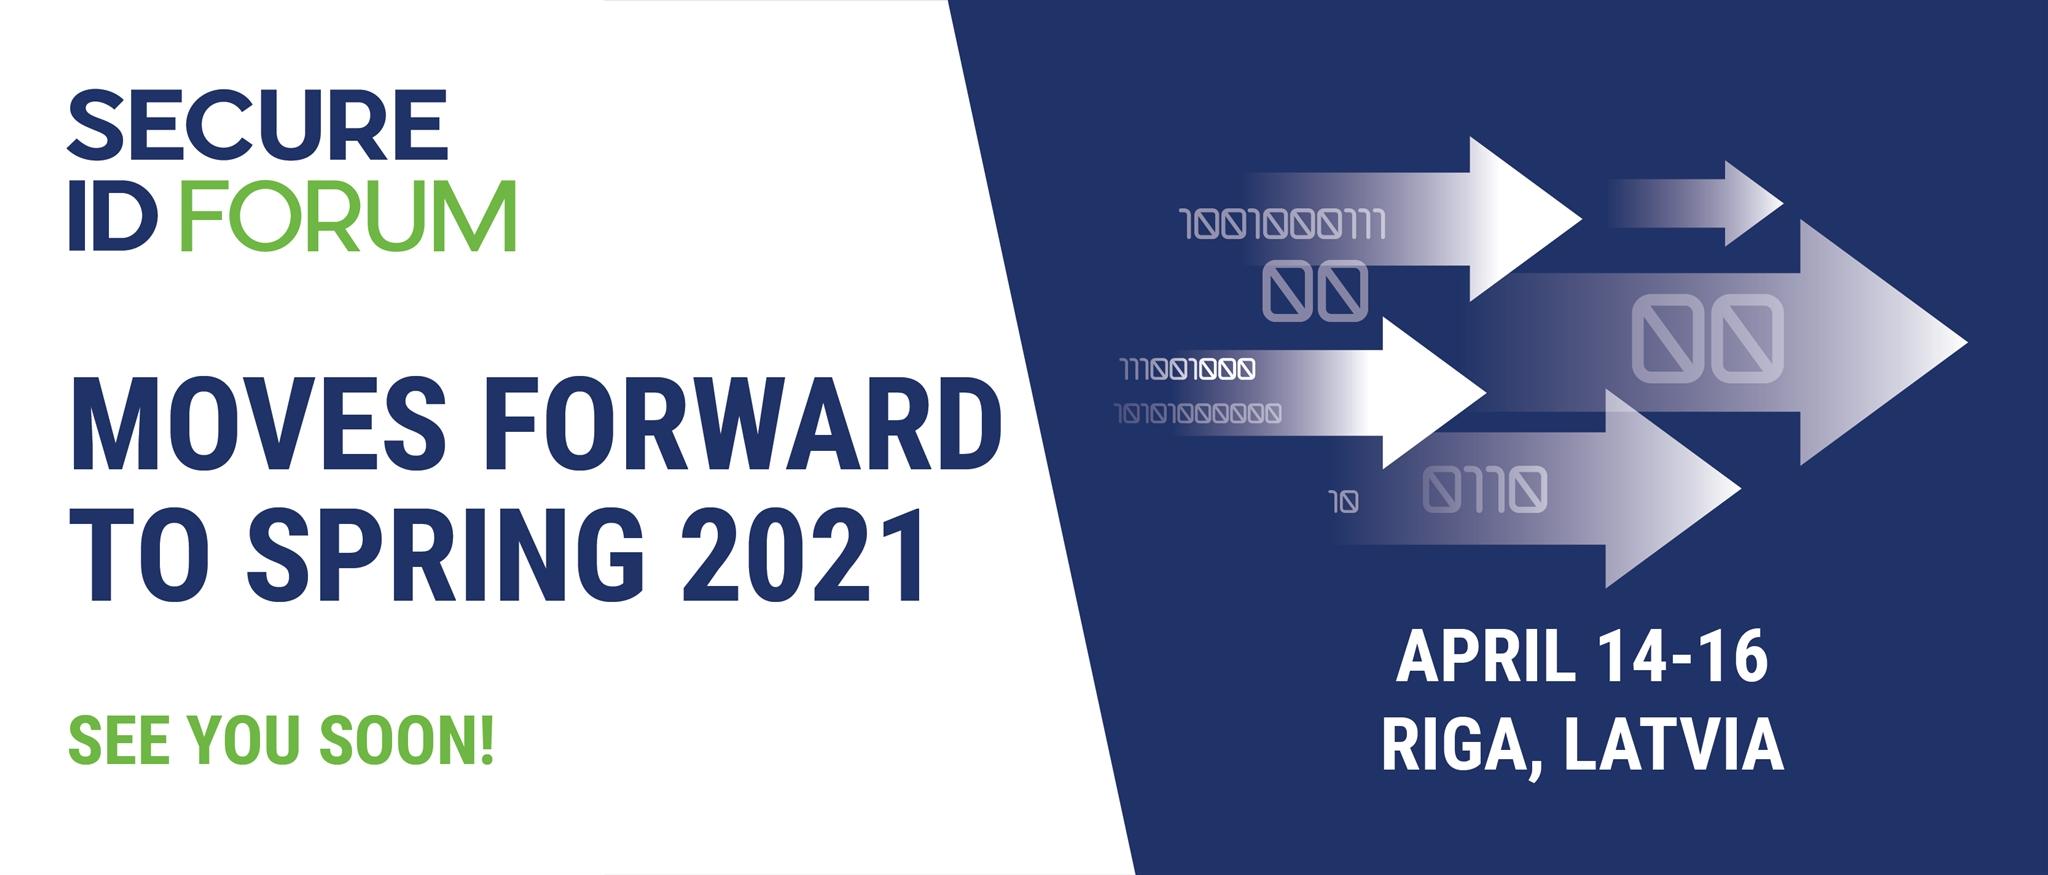 X Infotech - Secure Id 2020 - 14-16 Апреля 2021 Г.